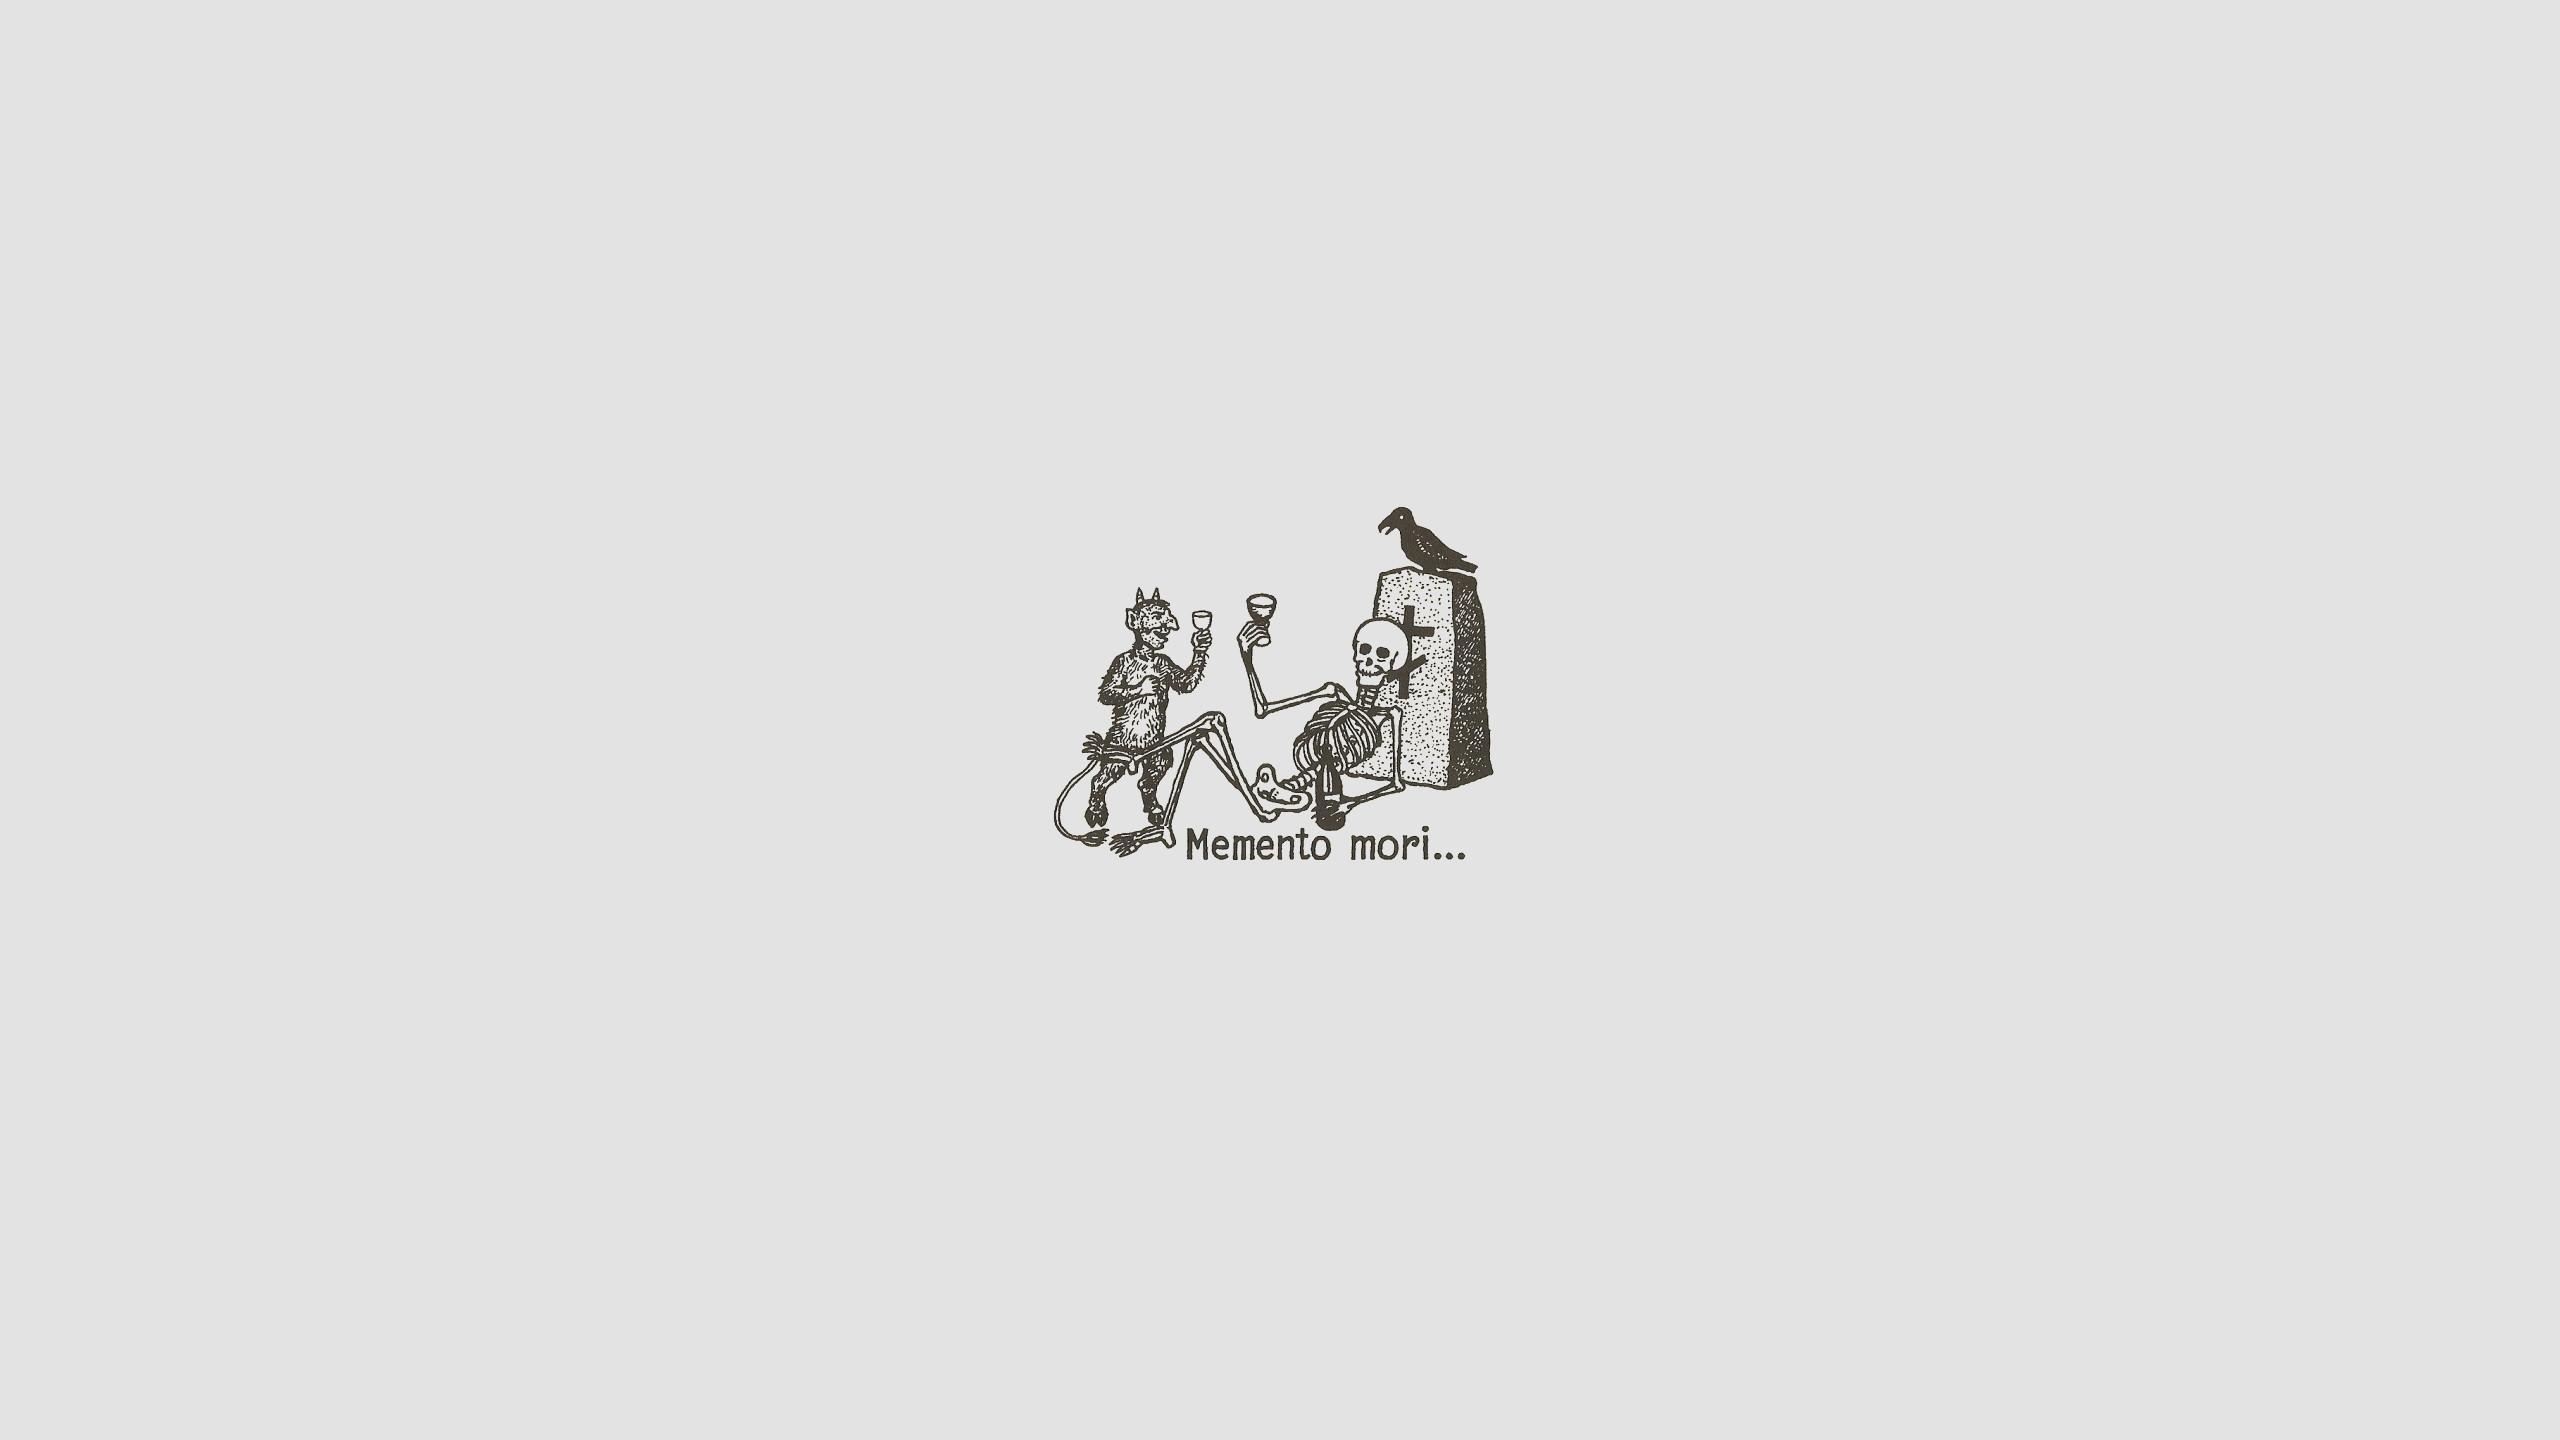 Res: 2560x1440, Memento mori wallpaper